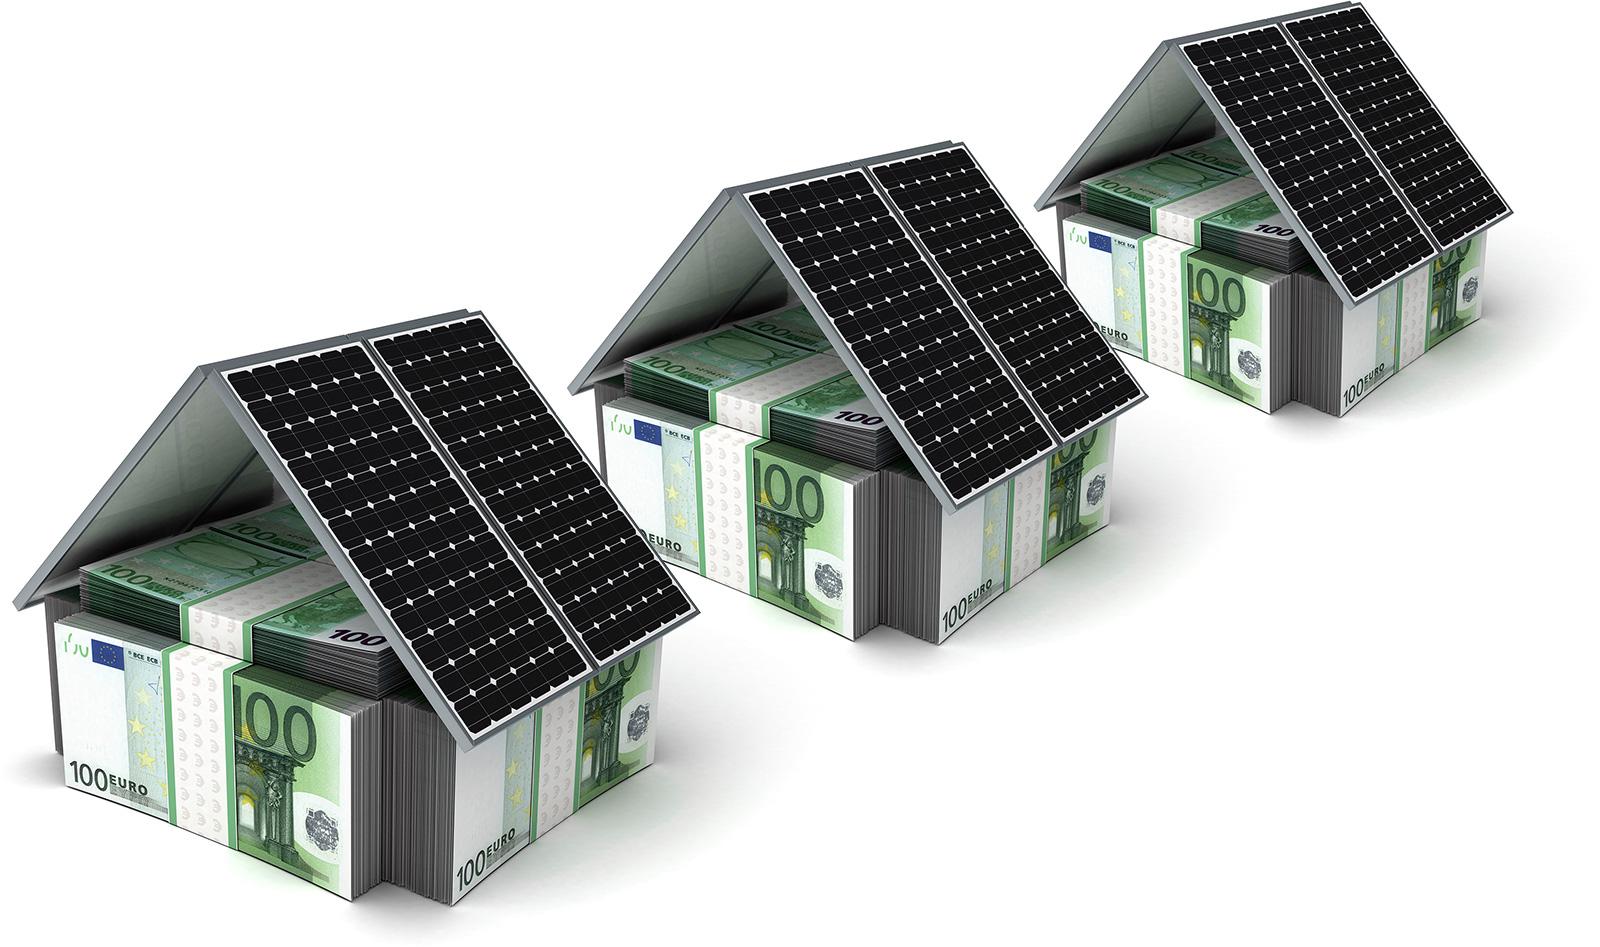 pavento solar btw teruggave